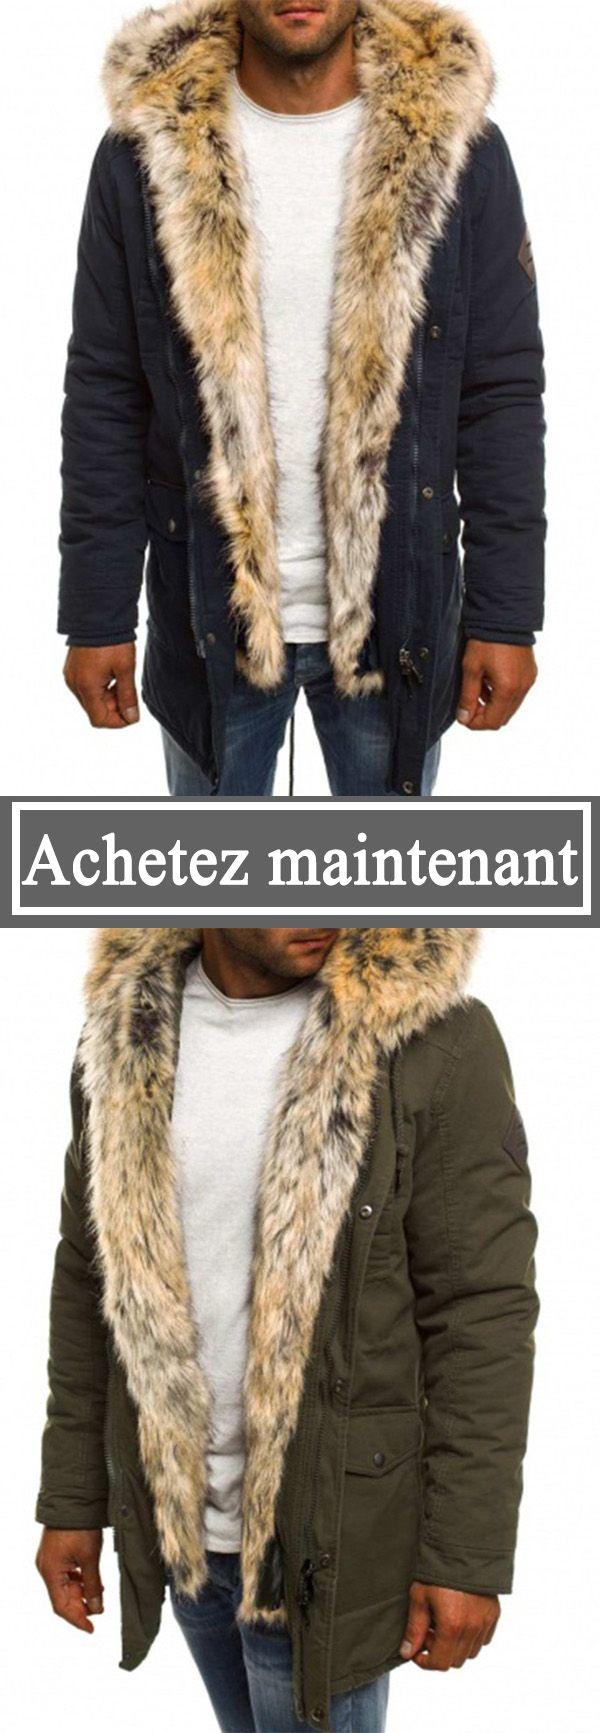 manteau homme hiver parka capuche grosse fourrure. Black Bedroom Furniture Sets. Home Design Ideas